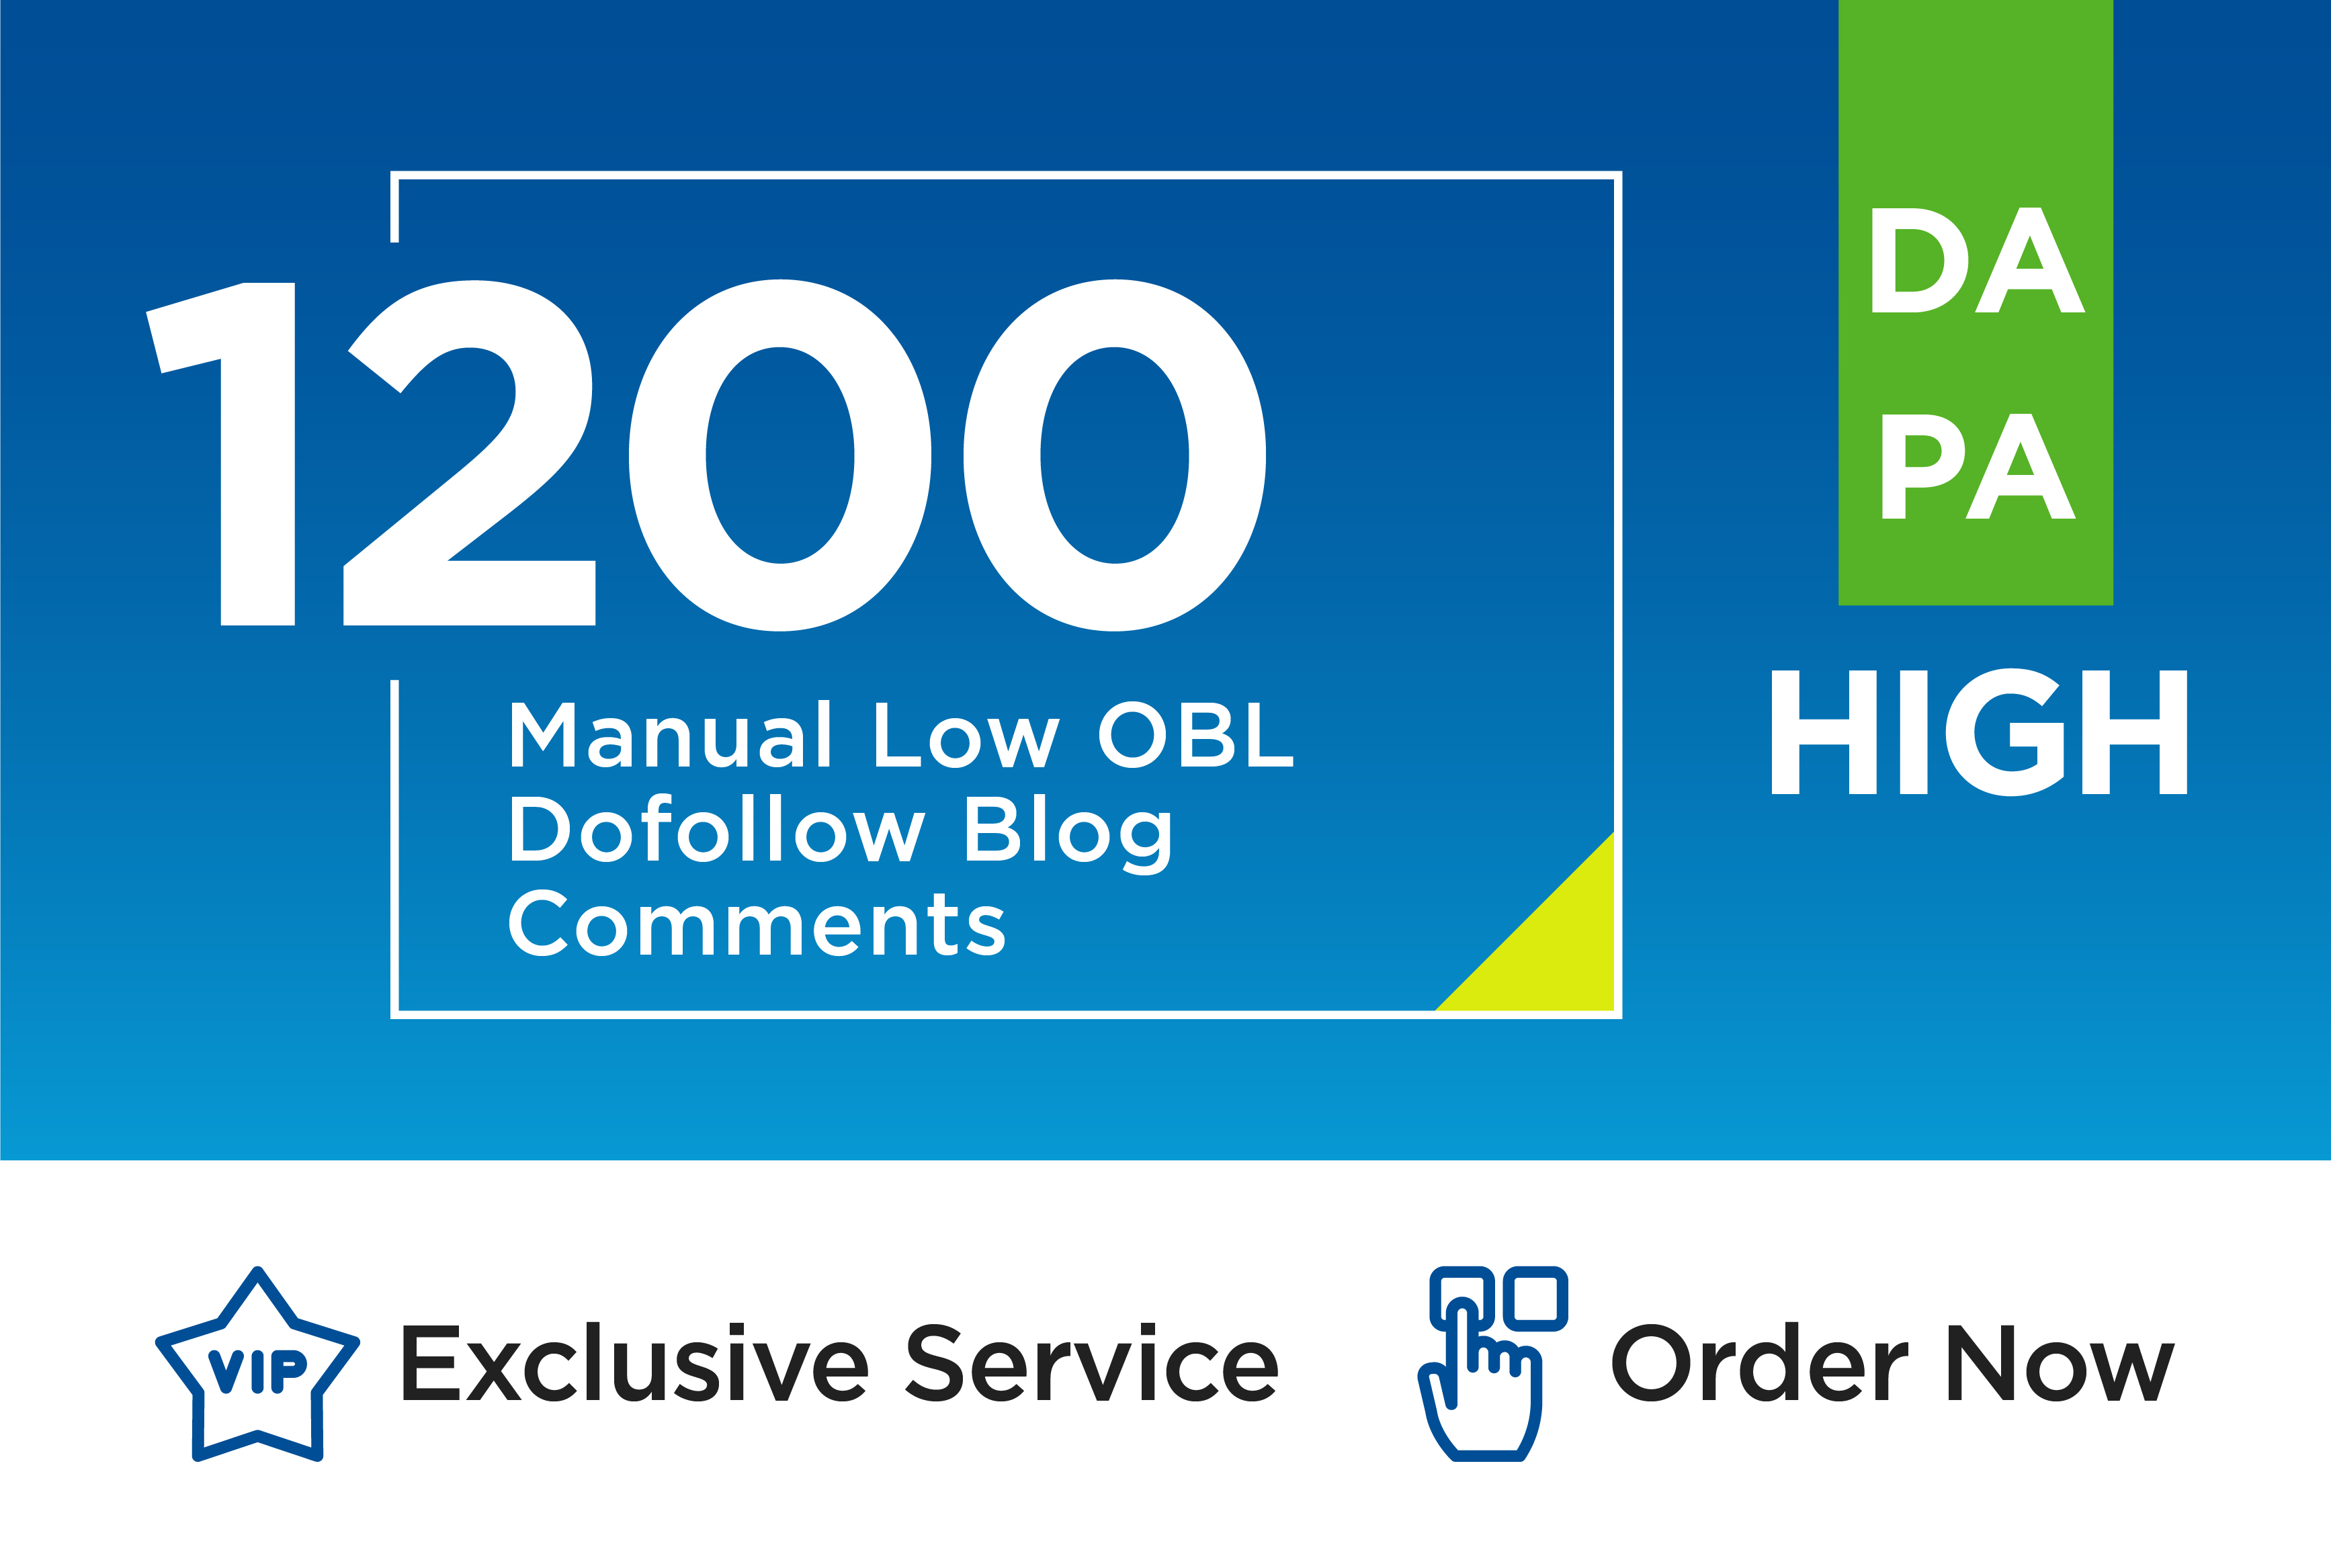 Create Manually 1200 high quality dofollow unique domain backlinks high da pa